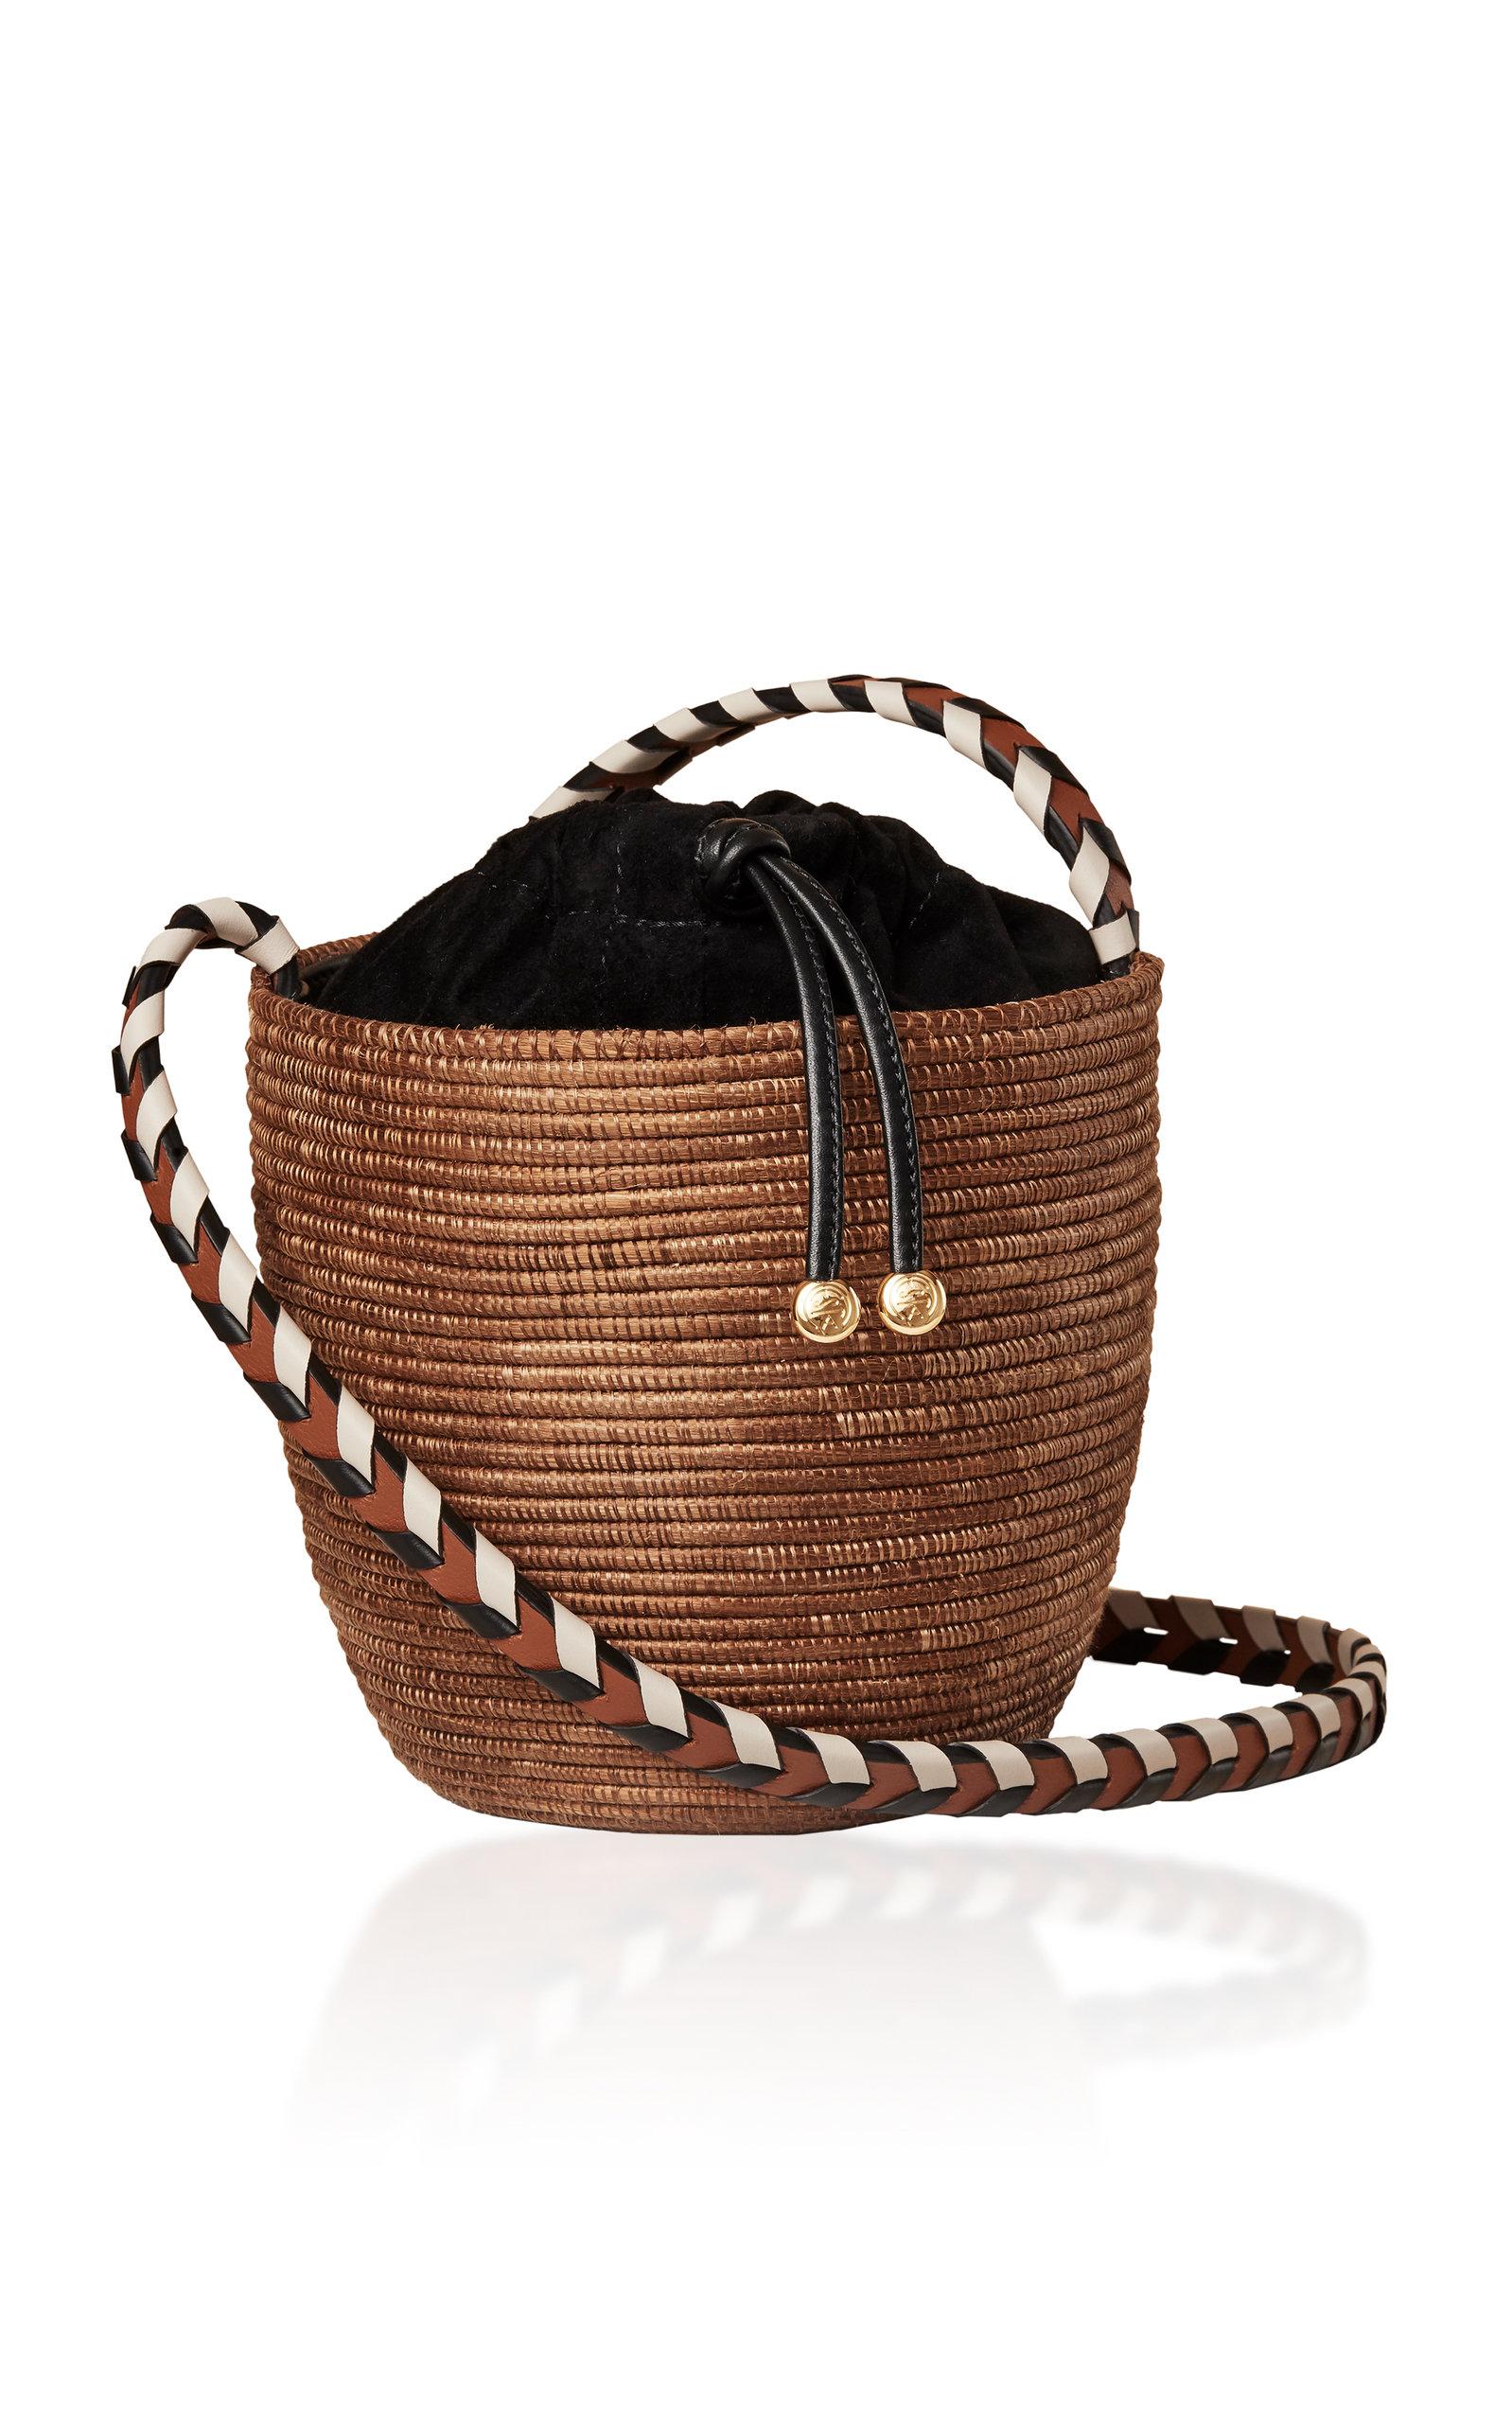 Cesta Collective Lunchpail Suede-Trimmed Straw Shoulder Bag